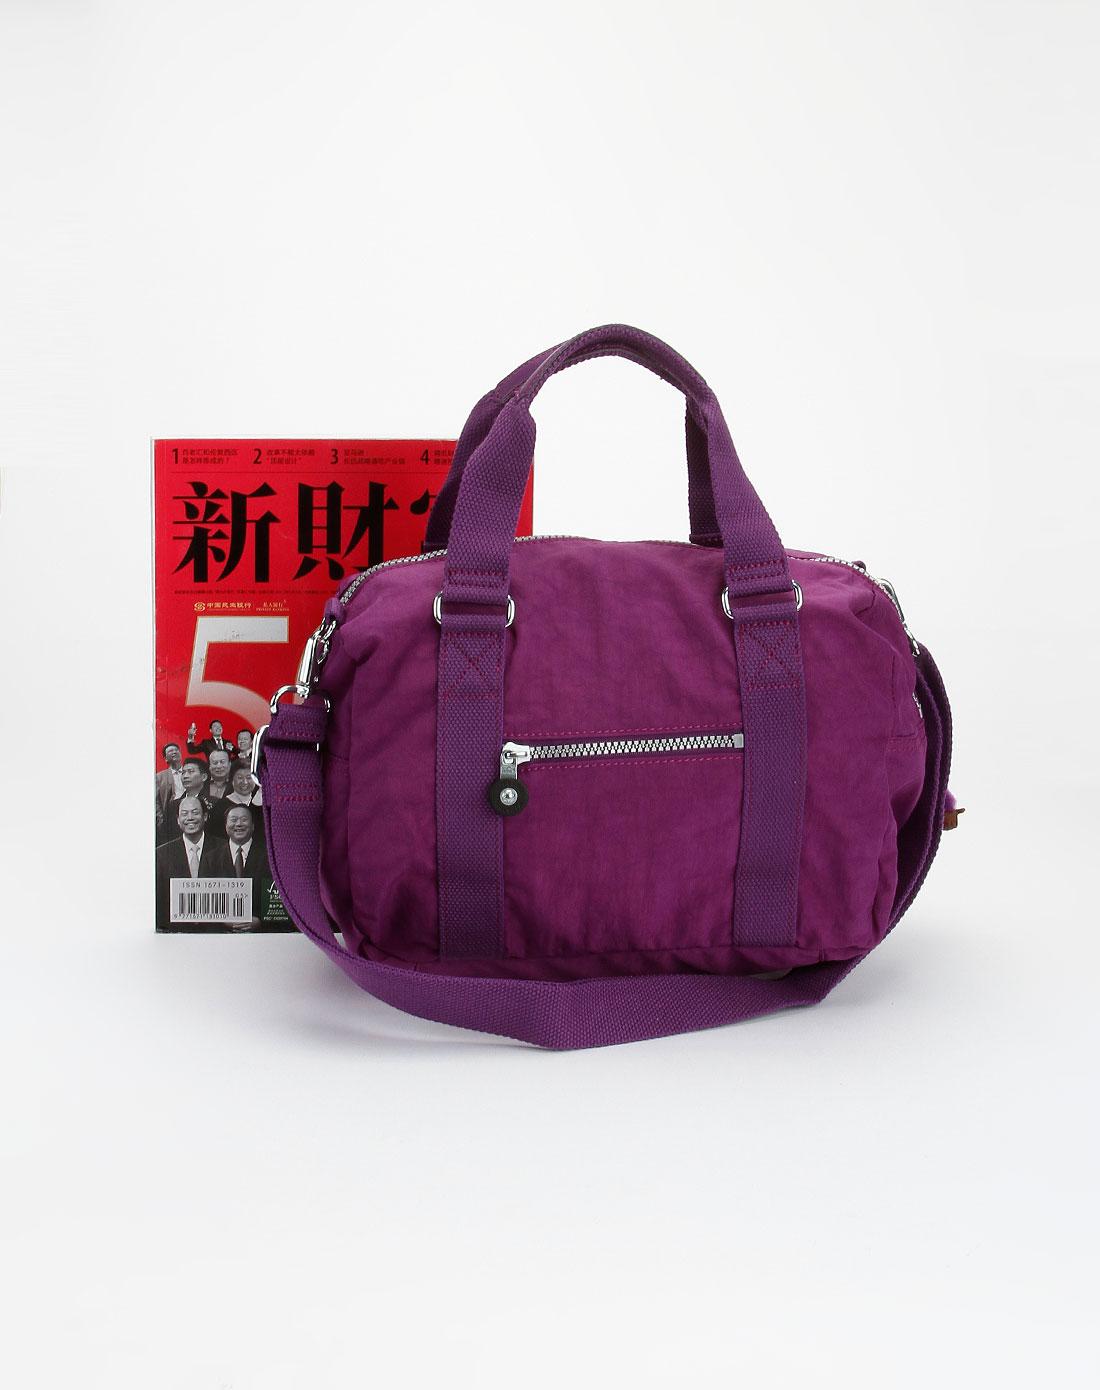 kipling紫色休闲斜挎包k13167607